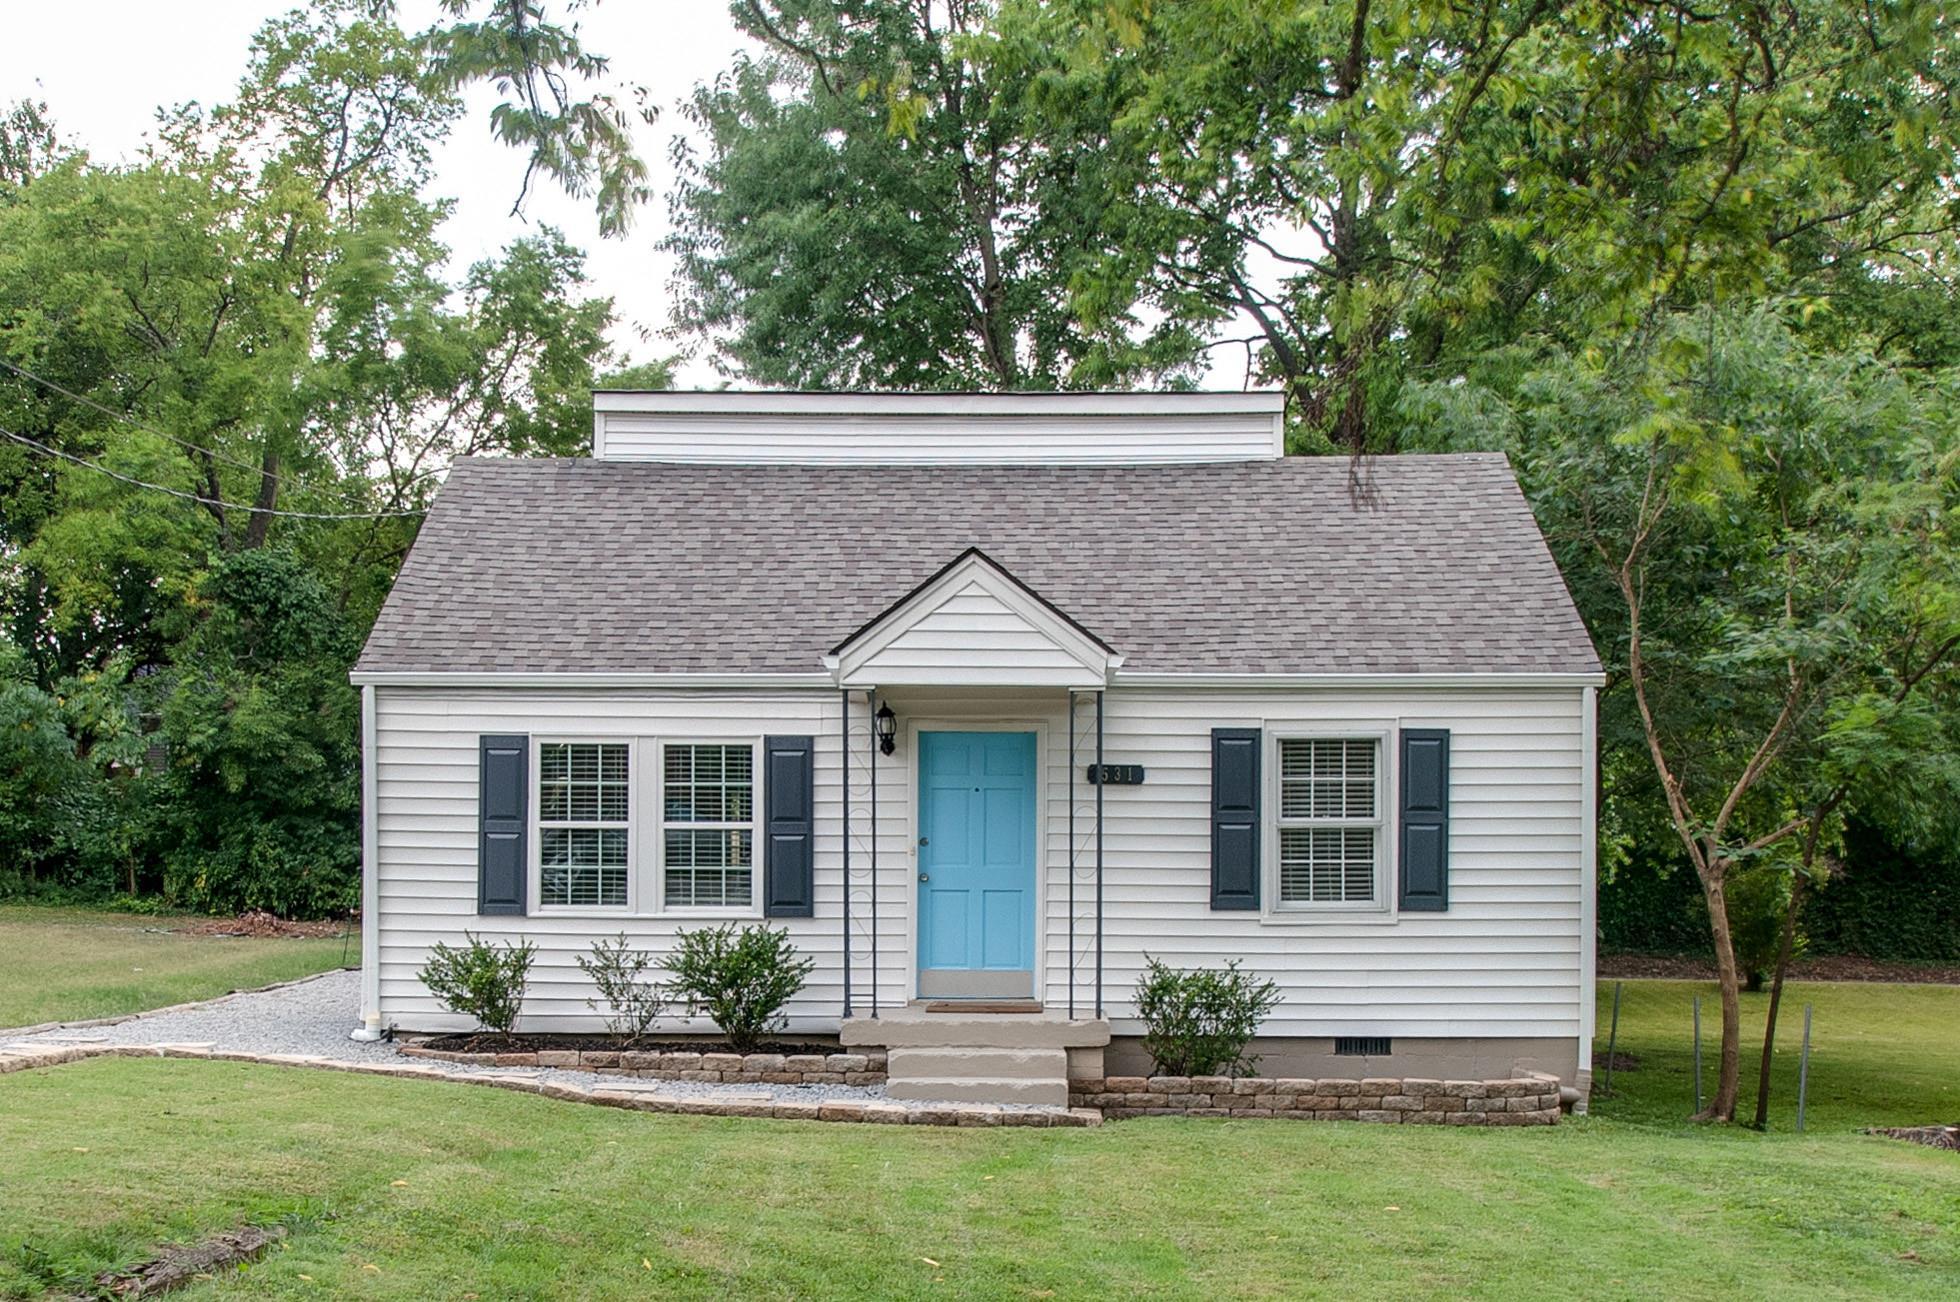 531 Elgin St, Nashville, TN 37211 - Nashville, TN real estate listing